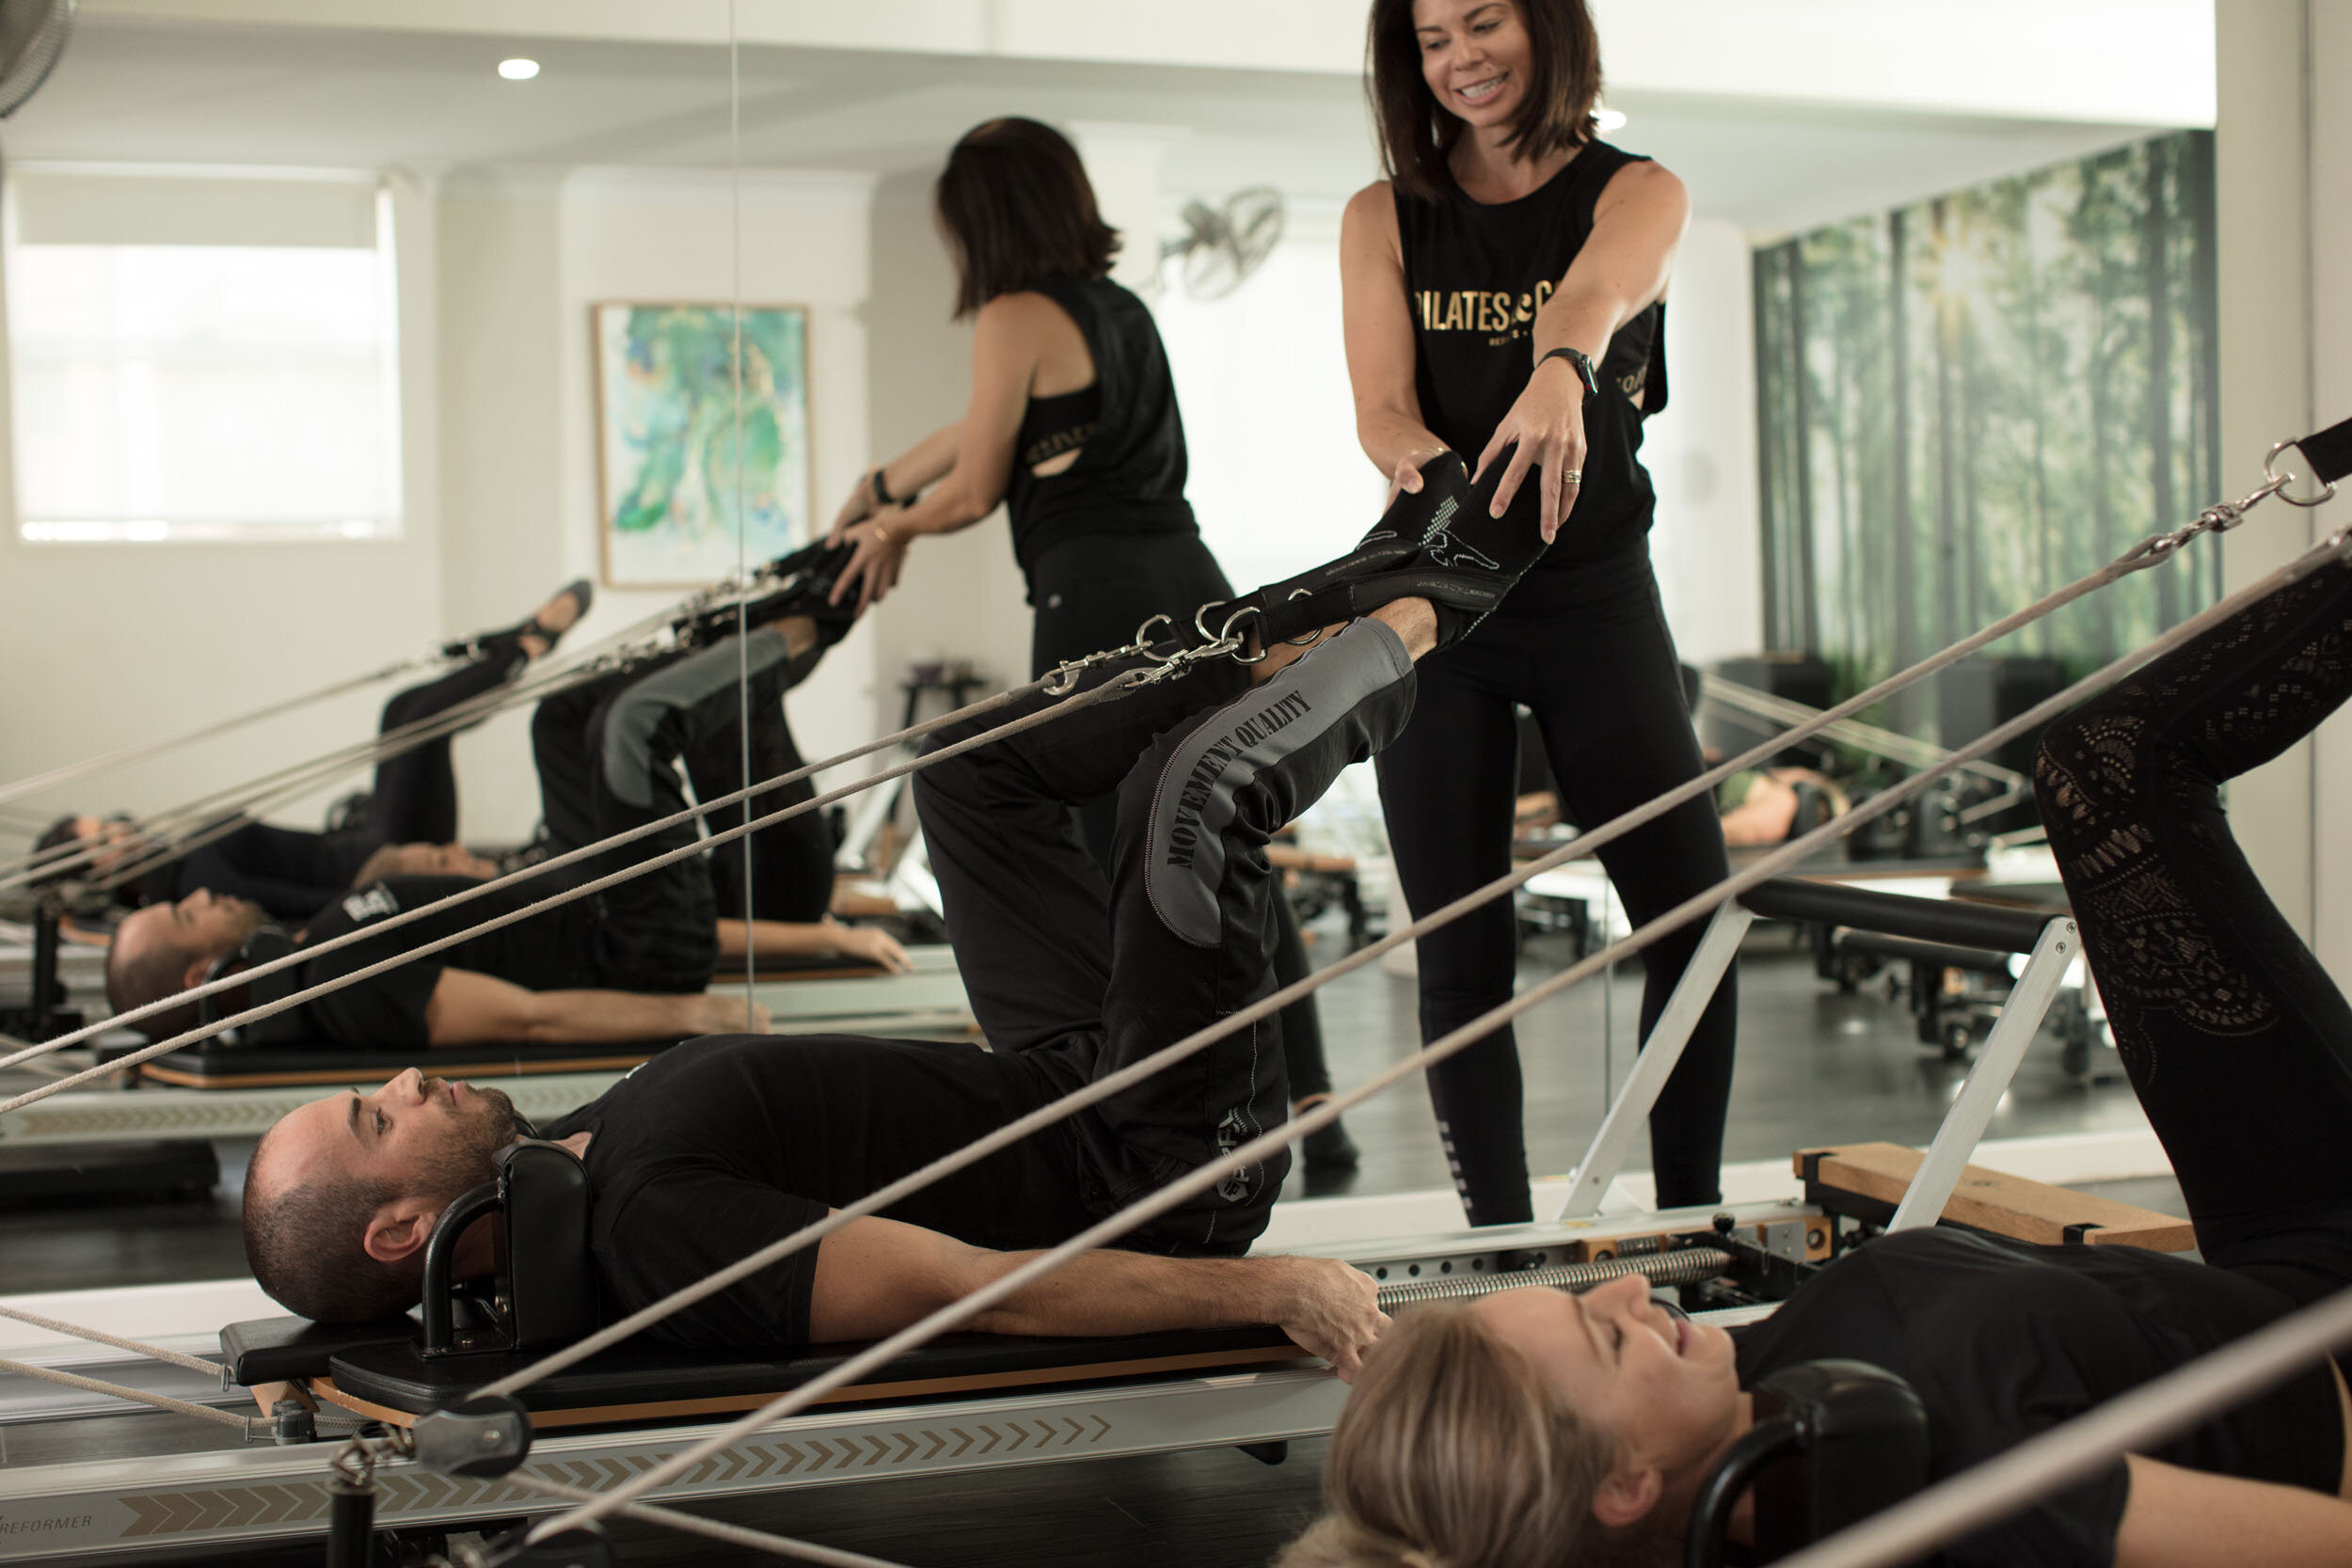 Pilates and Co Pilates Reformer Burleigh Miami 11.jpg